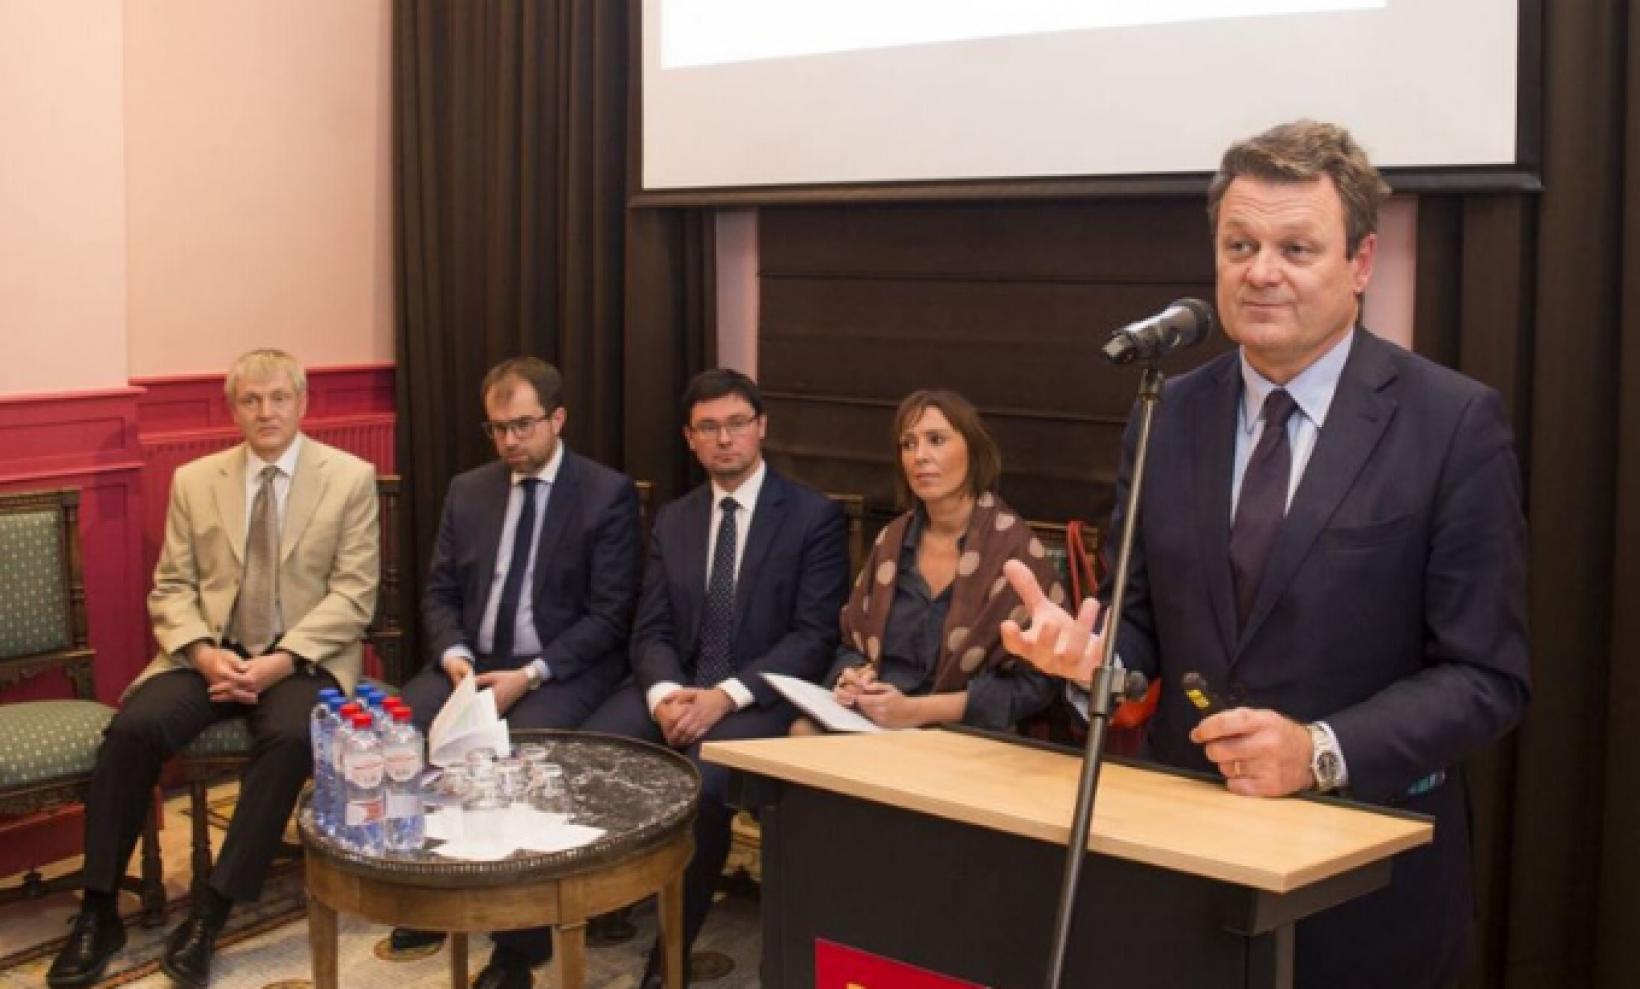 GSA Executive Director Carlo des Dorides speaking at the Prague House debate.